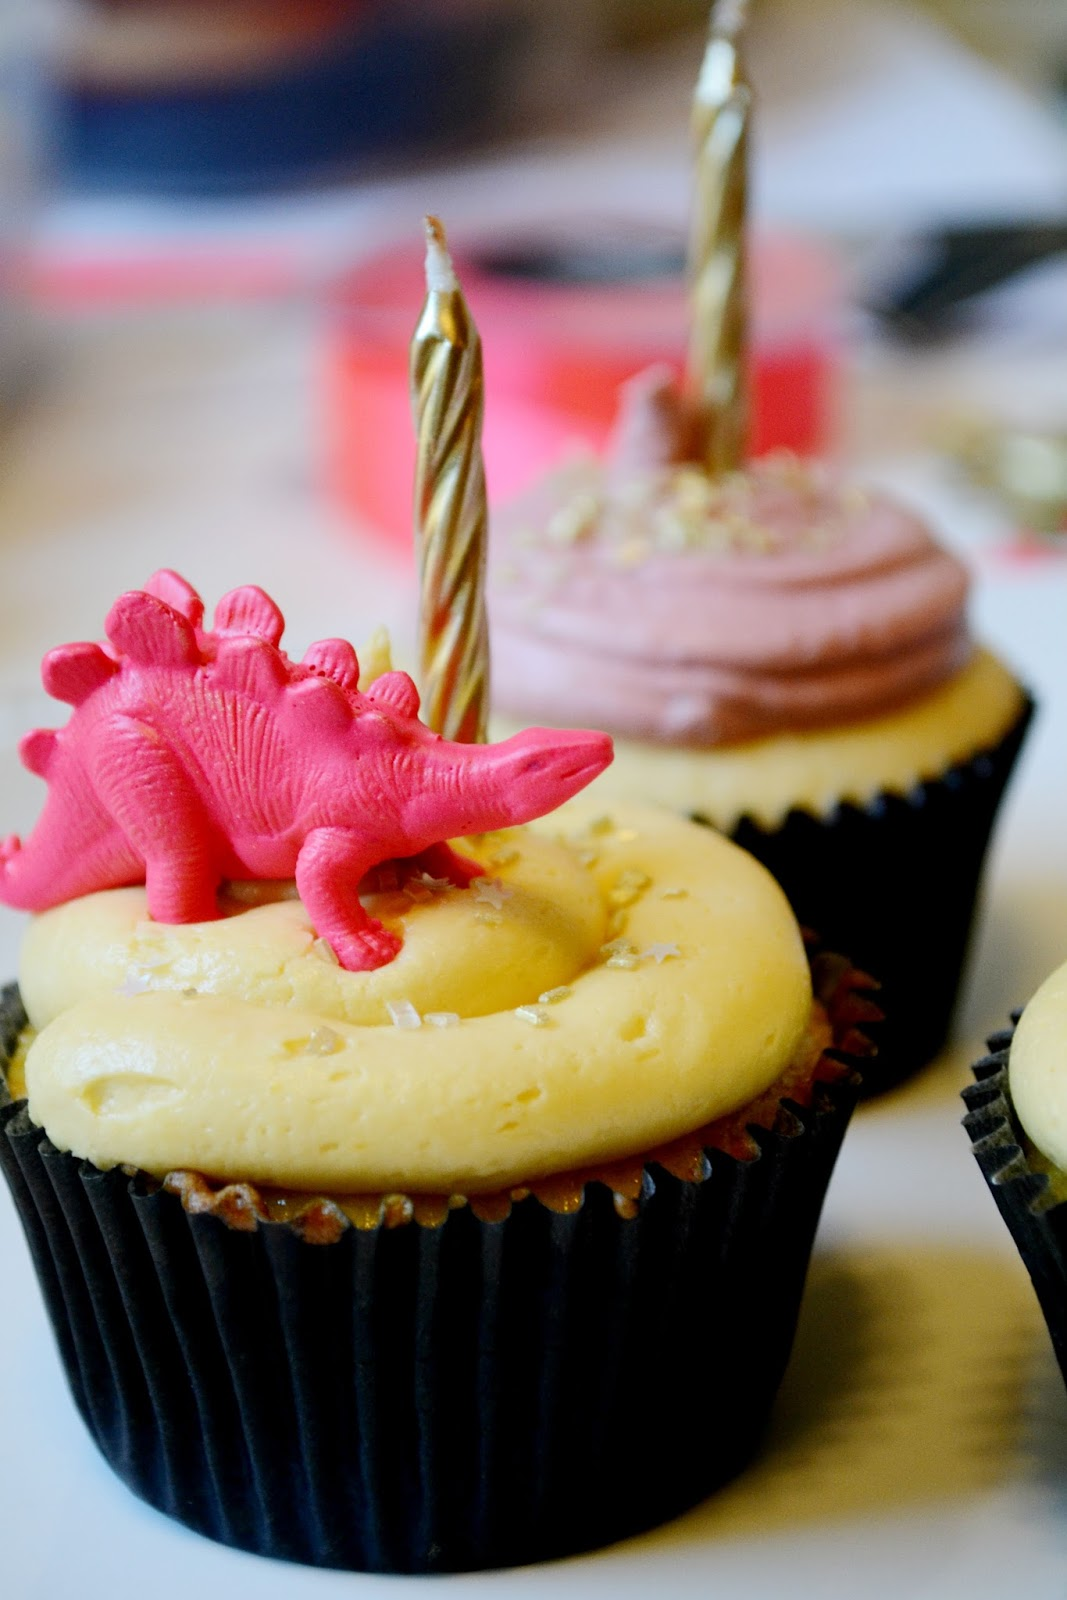 dinosaur, neon pink, cupcake, apricot, gold,